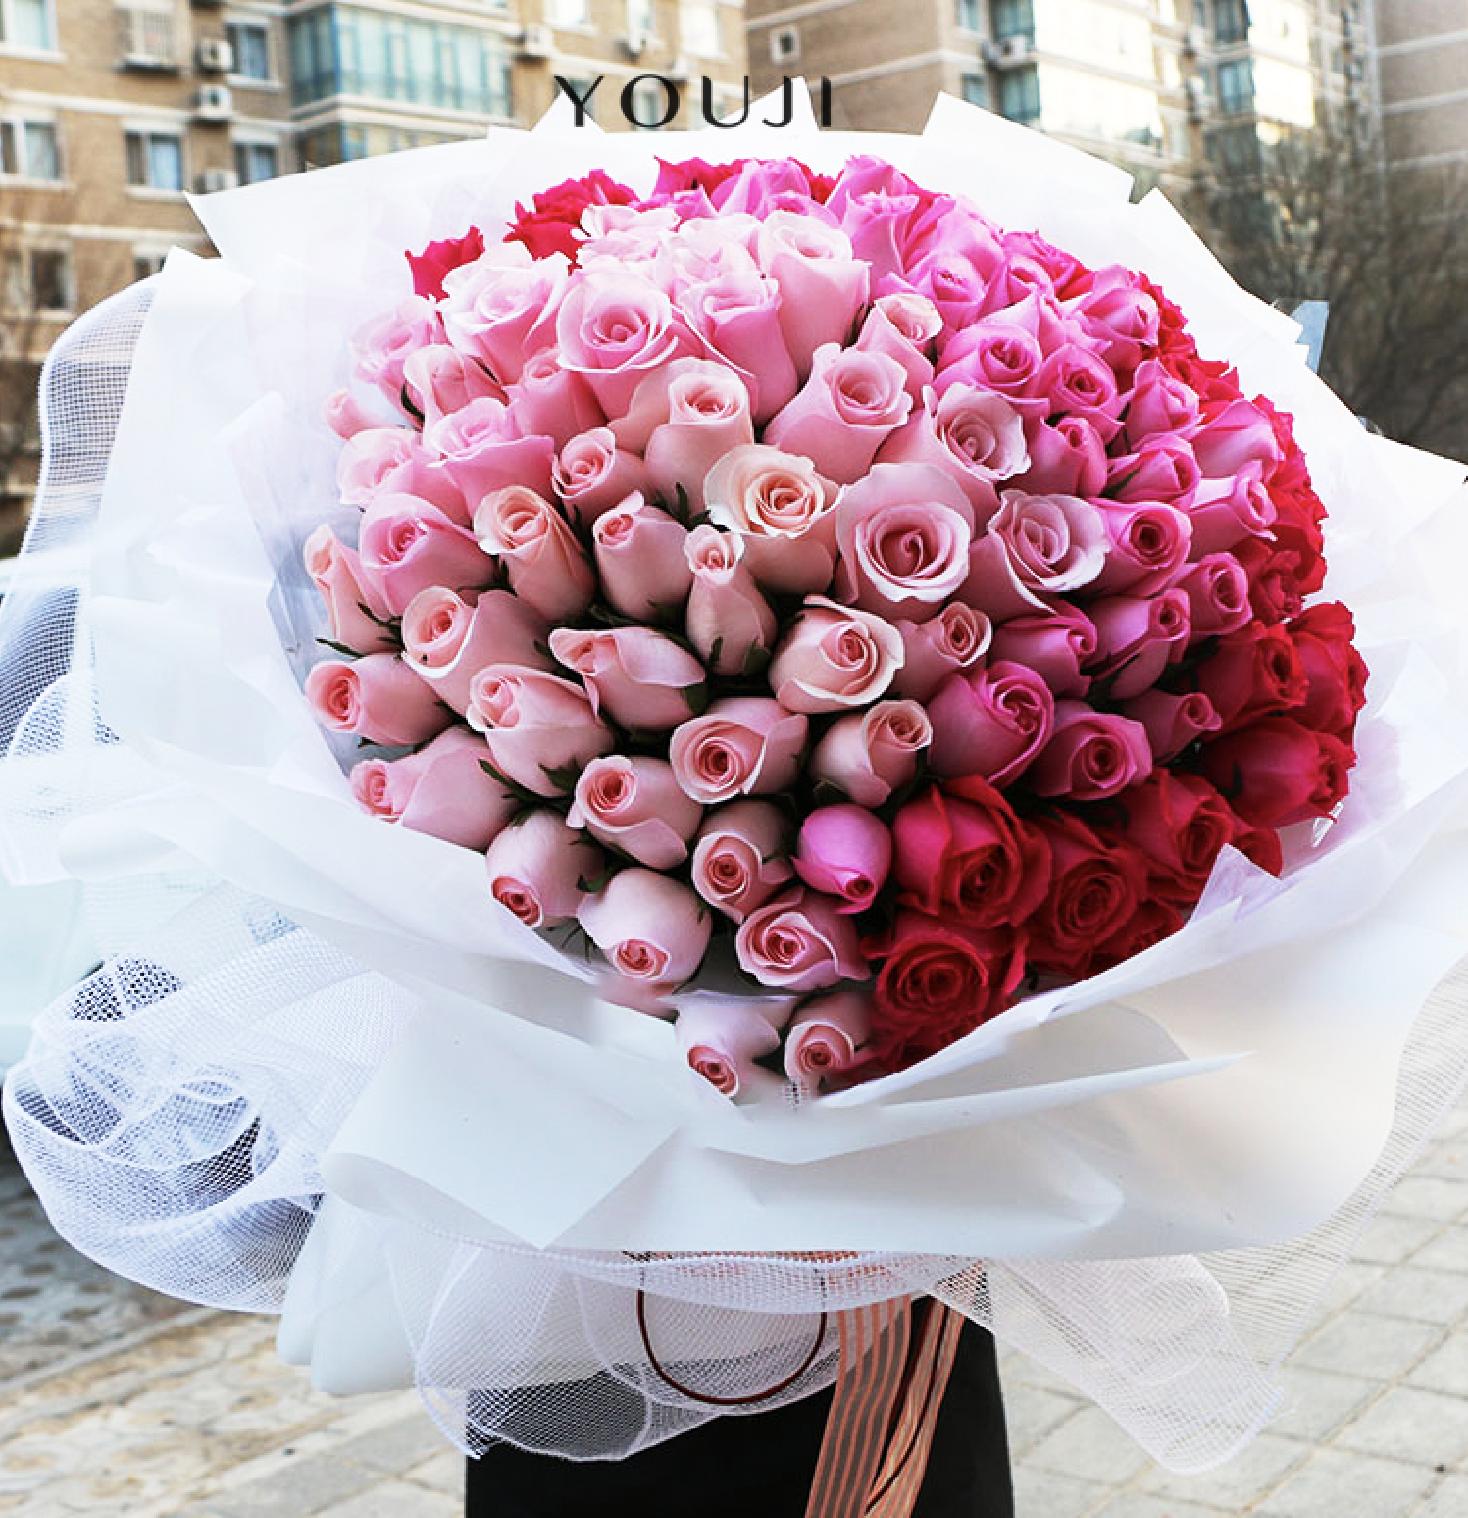 YOUJI尤己鲜花花束定制-99朵玫瑰99朵浅粉玫瑰桃粉桃红玫瑰多色混搭生日纪念日情人节